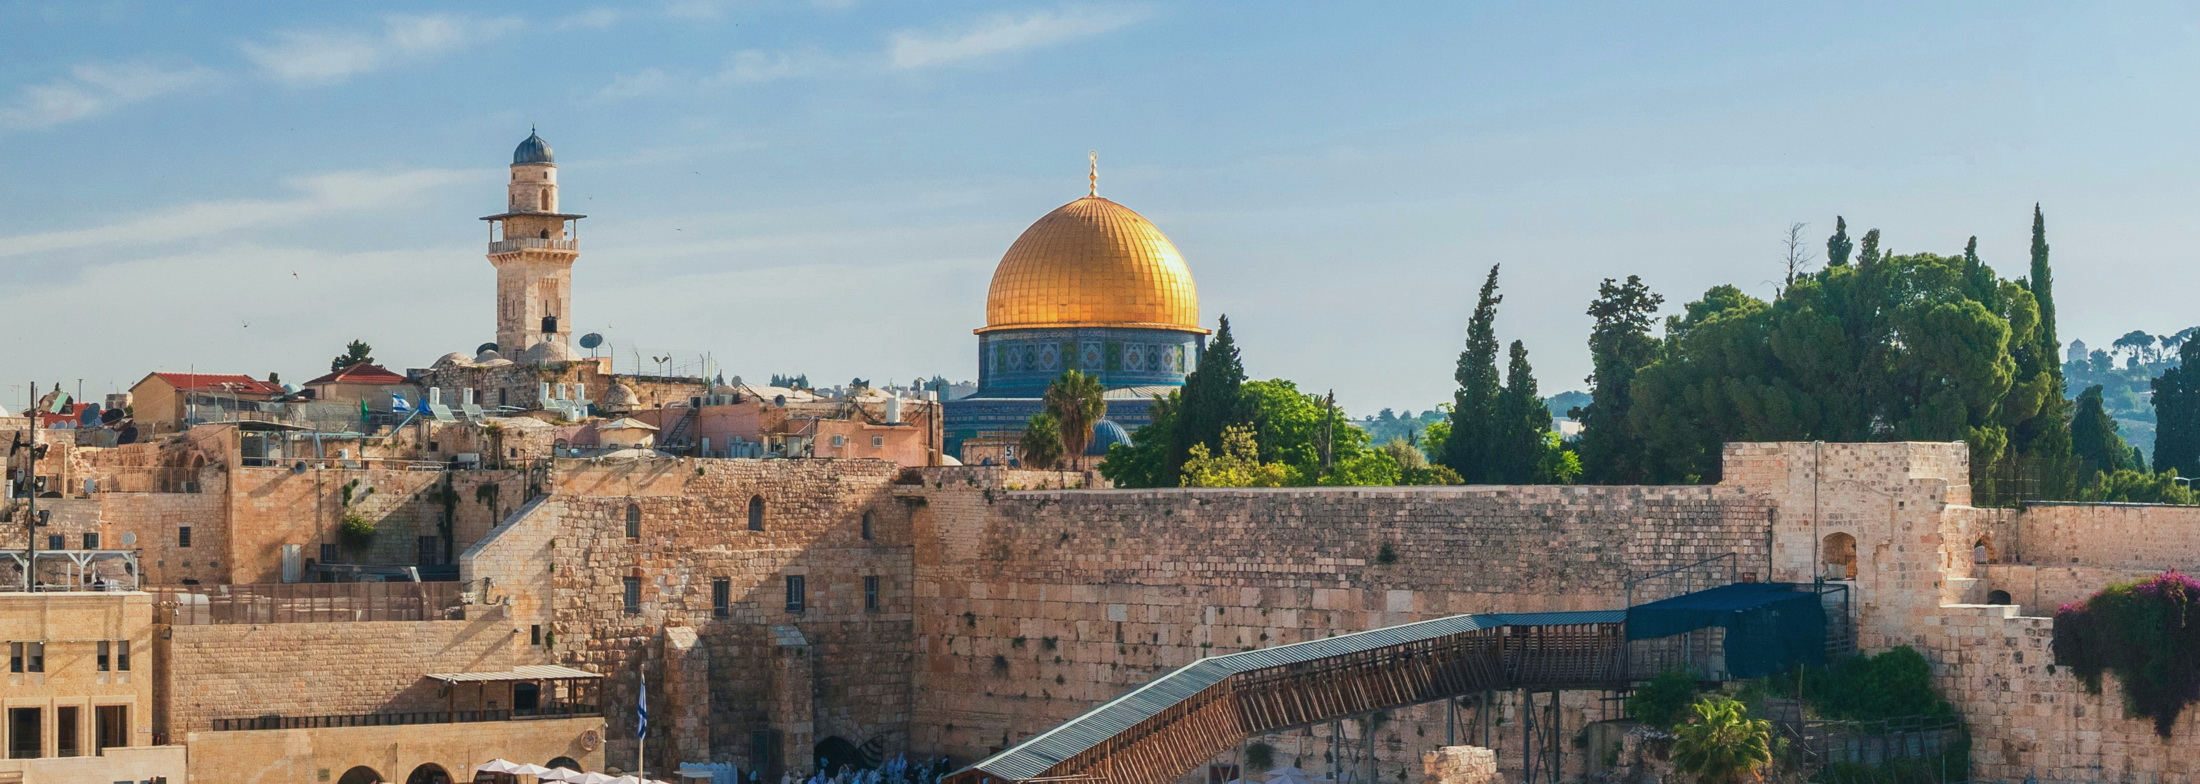 Galileja – Nazaret – Genezaretsko jezero – Gileadsko gorje – Madaba – Amman – Petra – Mrtvo more – Jeruzalem – Betlehem – Maslinska gora